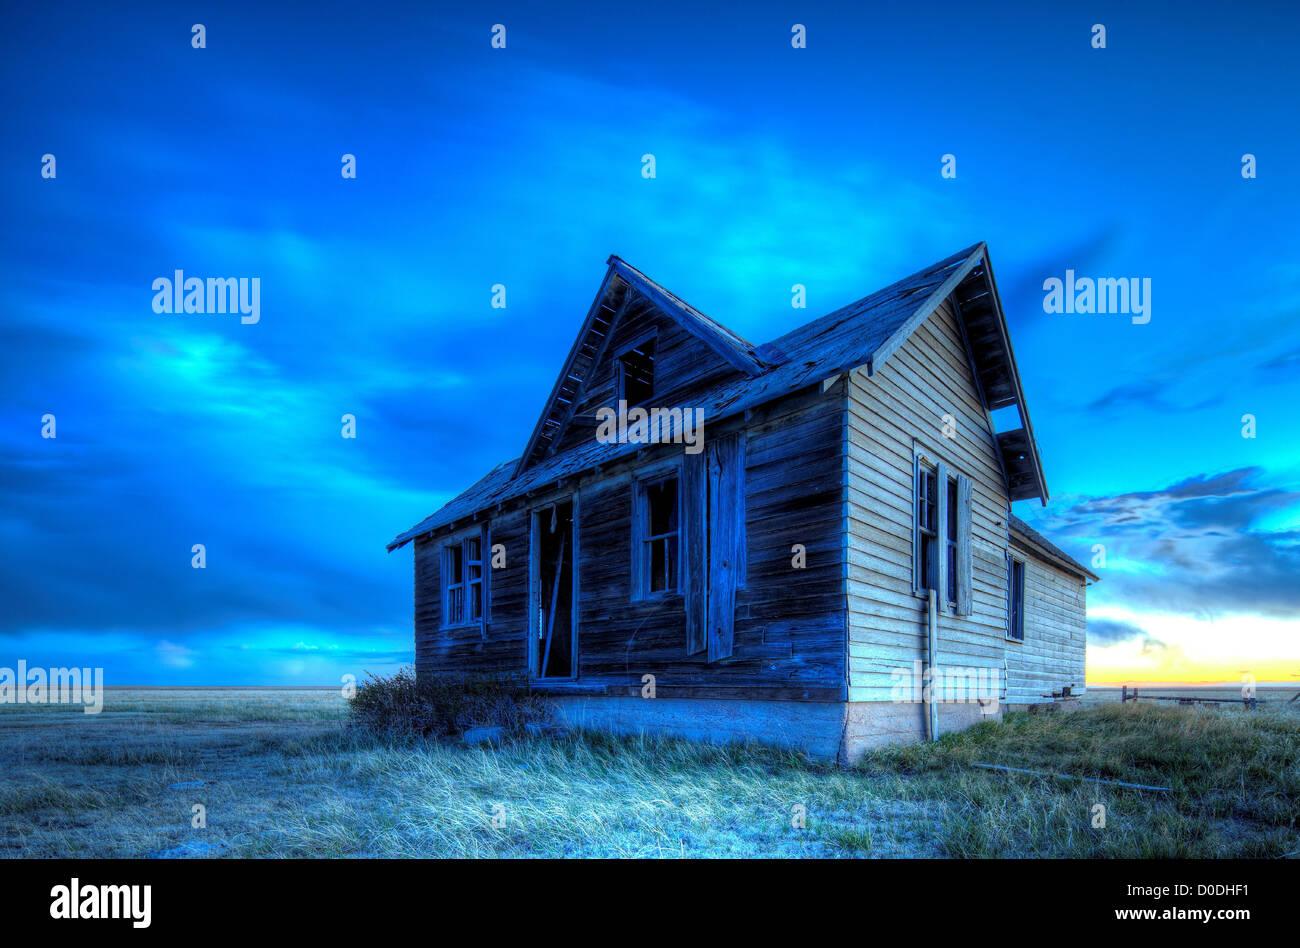 Abandoned ranch house, dusk, Colorado - Stock Image